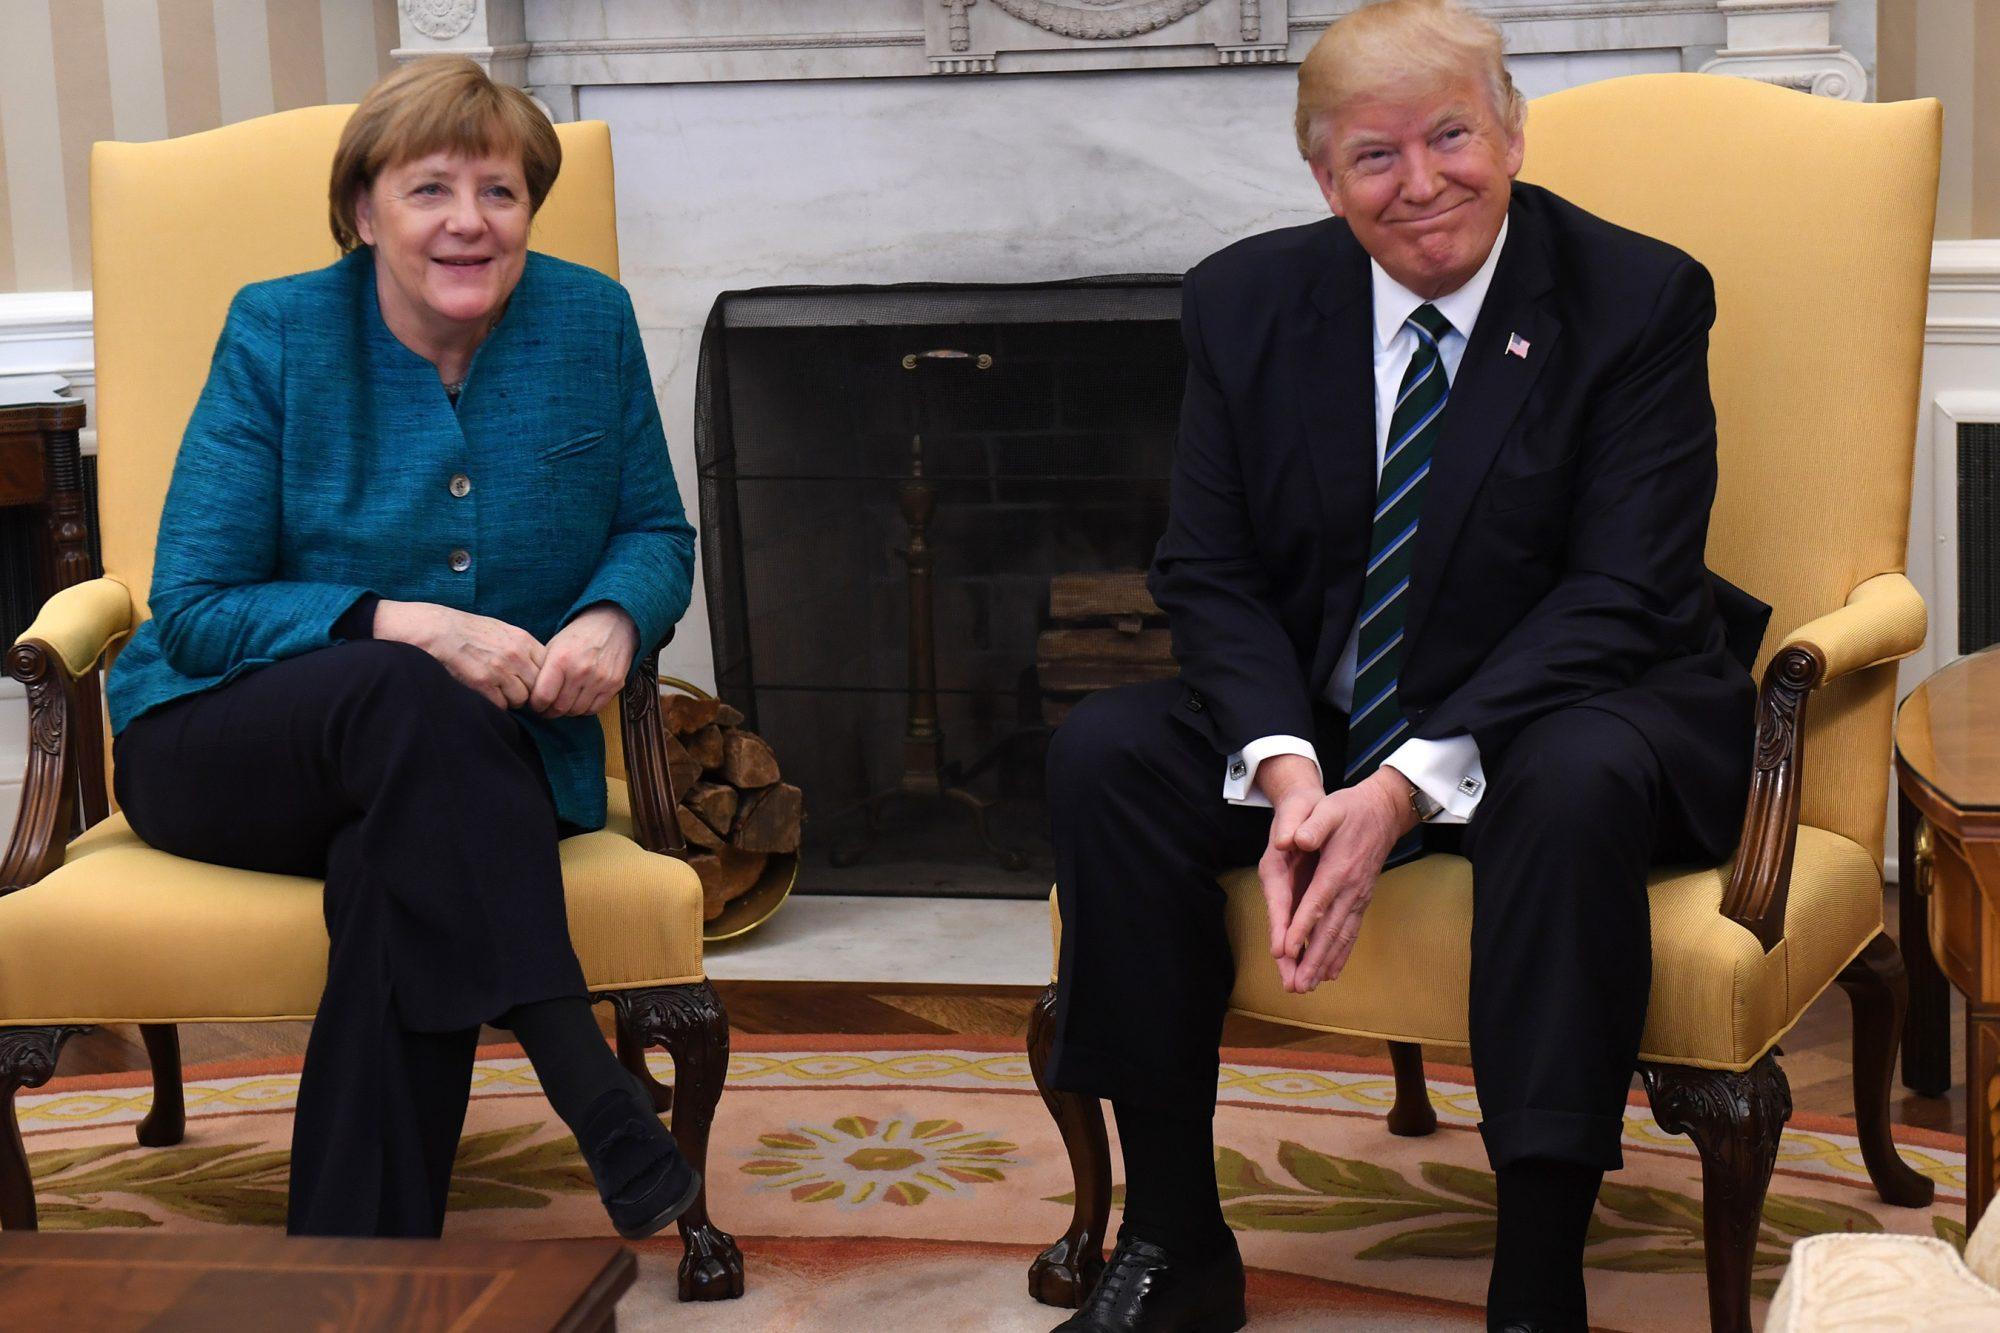 President Trump Welcomes German Chancellor Angela Merkel To The White House